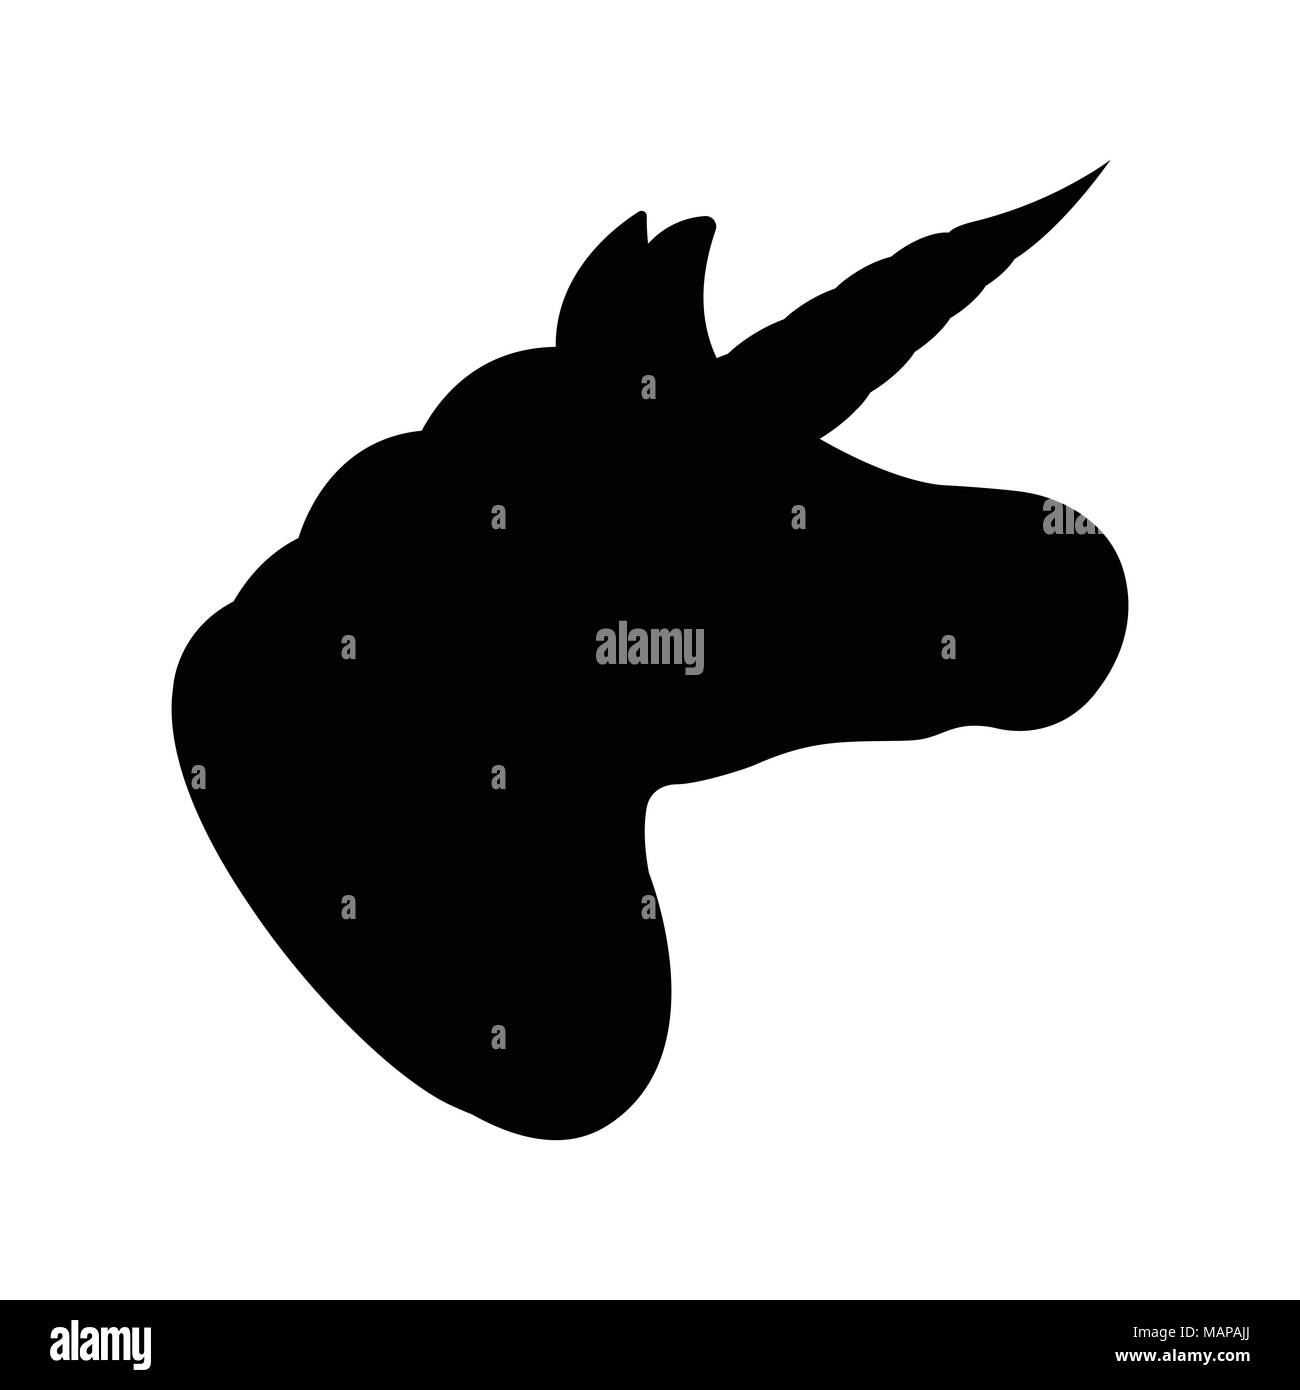 Unicorn icon. Fantasy World of the Unicorn. Black and Simple style. Vector Illustration. - Stock Image